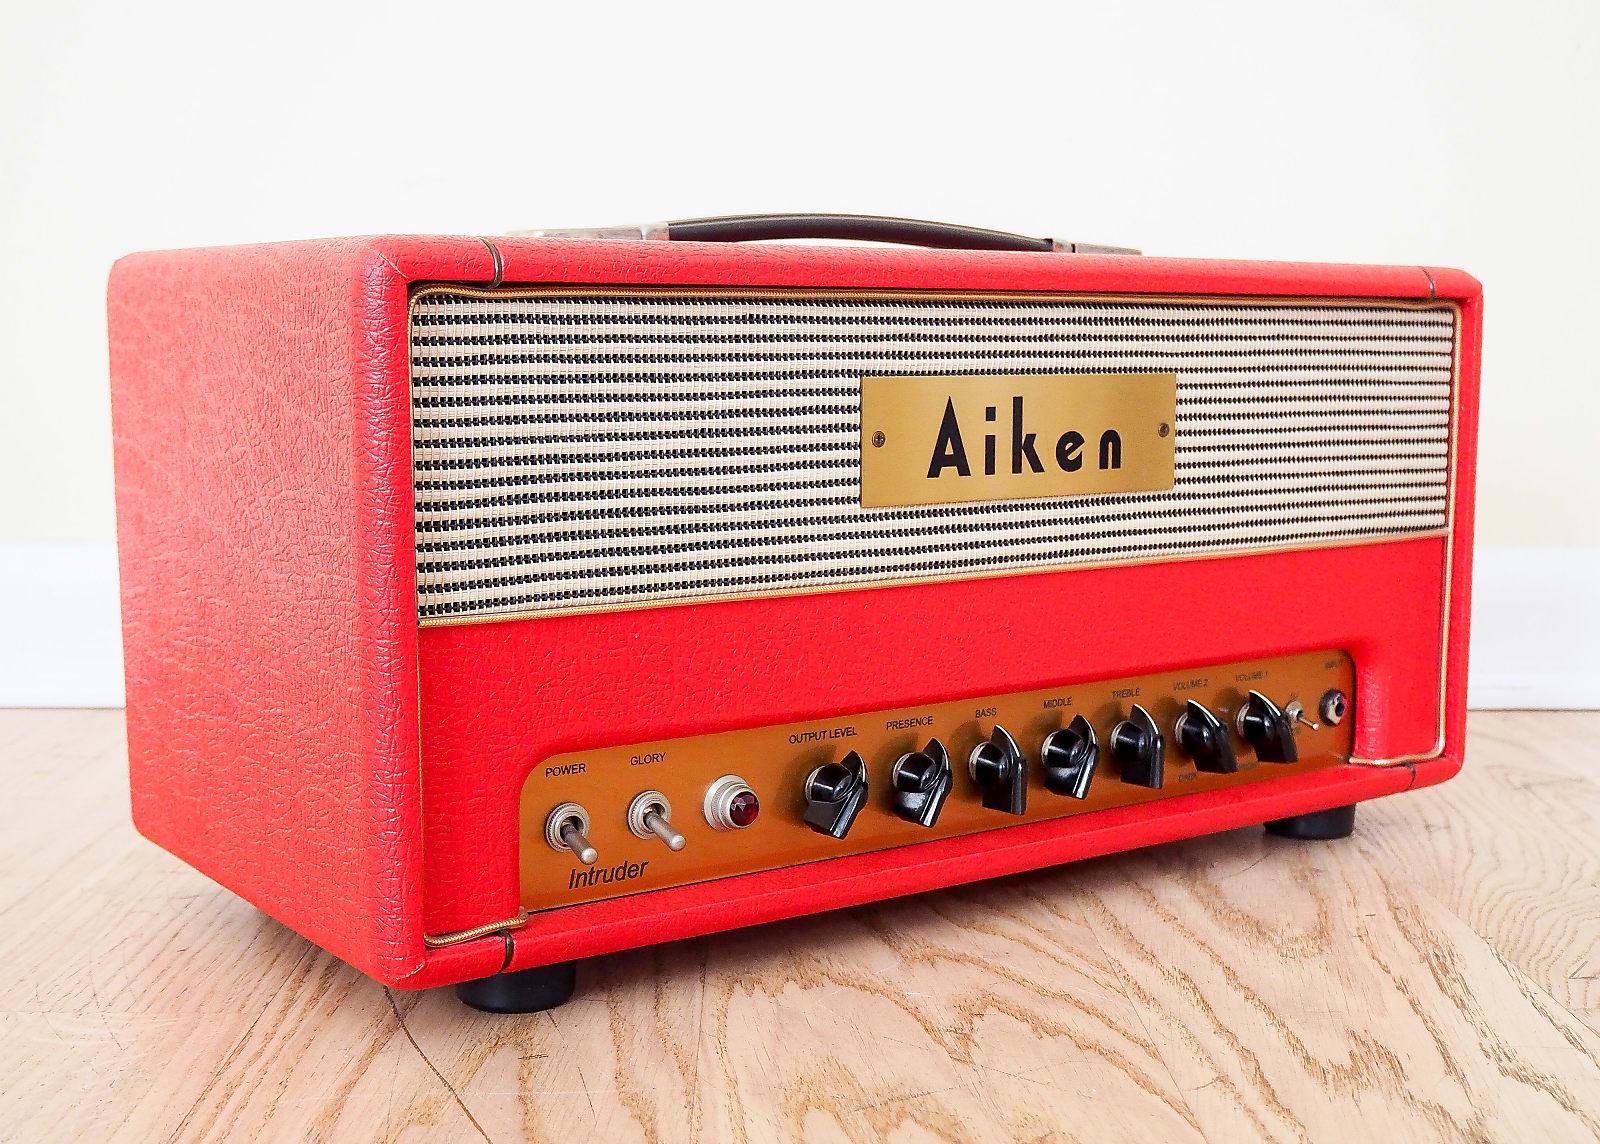 Aiken Intruder Boutique Tube Amplifier Head Prototype 18w El84 Red 5w Schematic